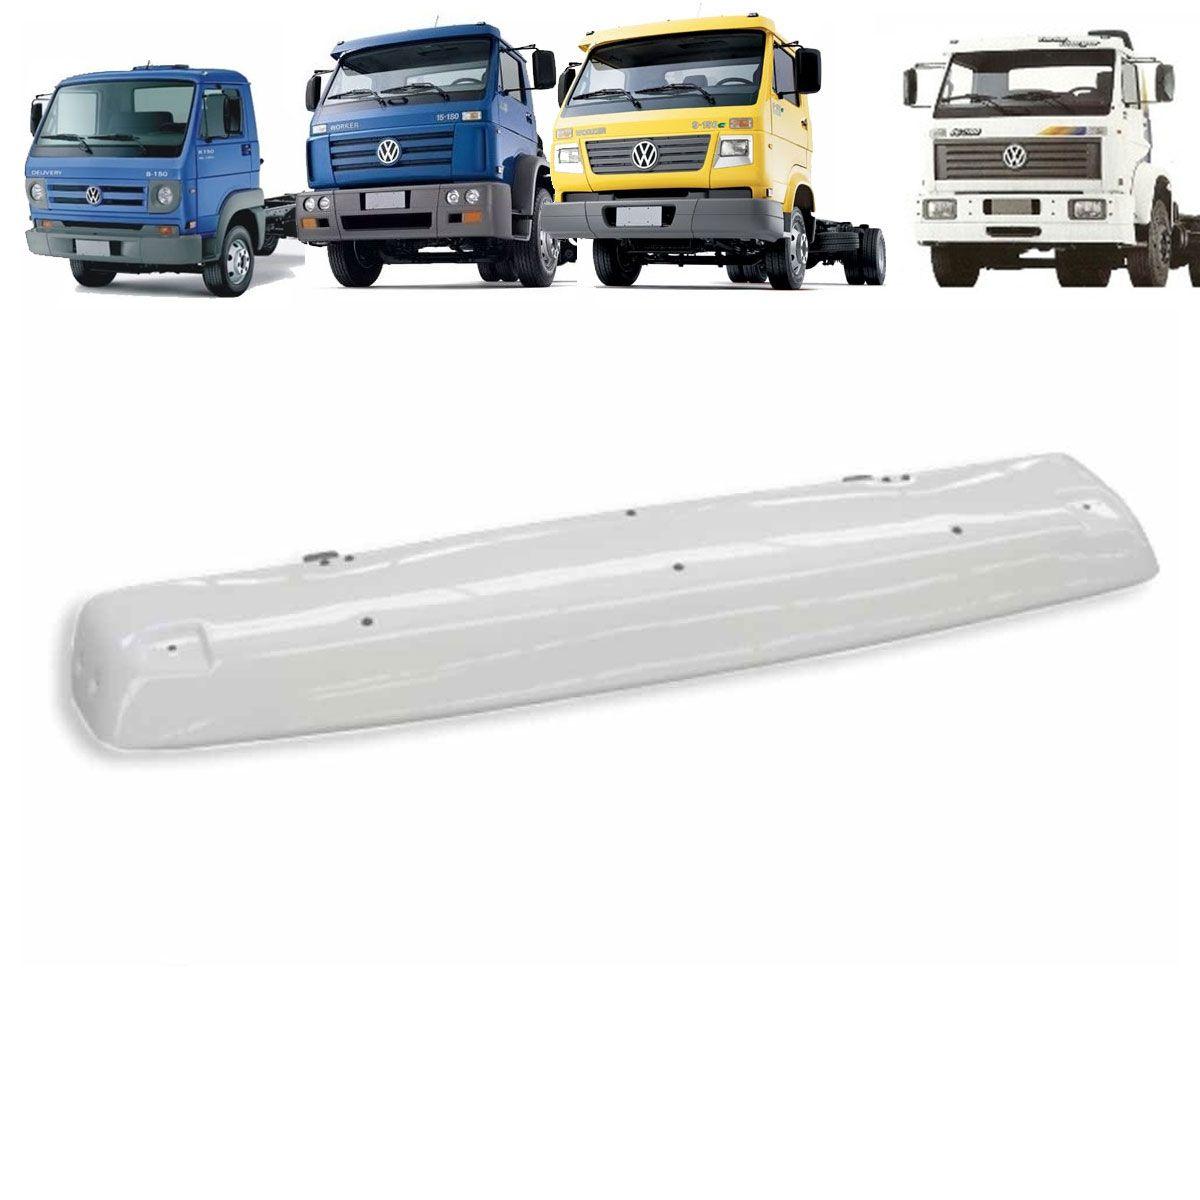 Tapa-sol para Volkswagen 16300 Worker | Delivery | Titan